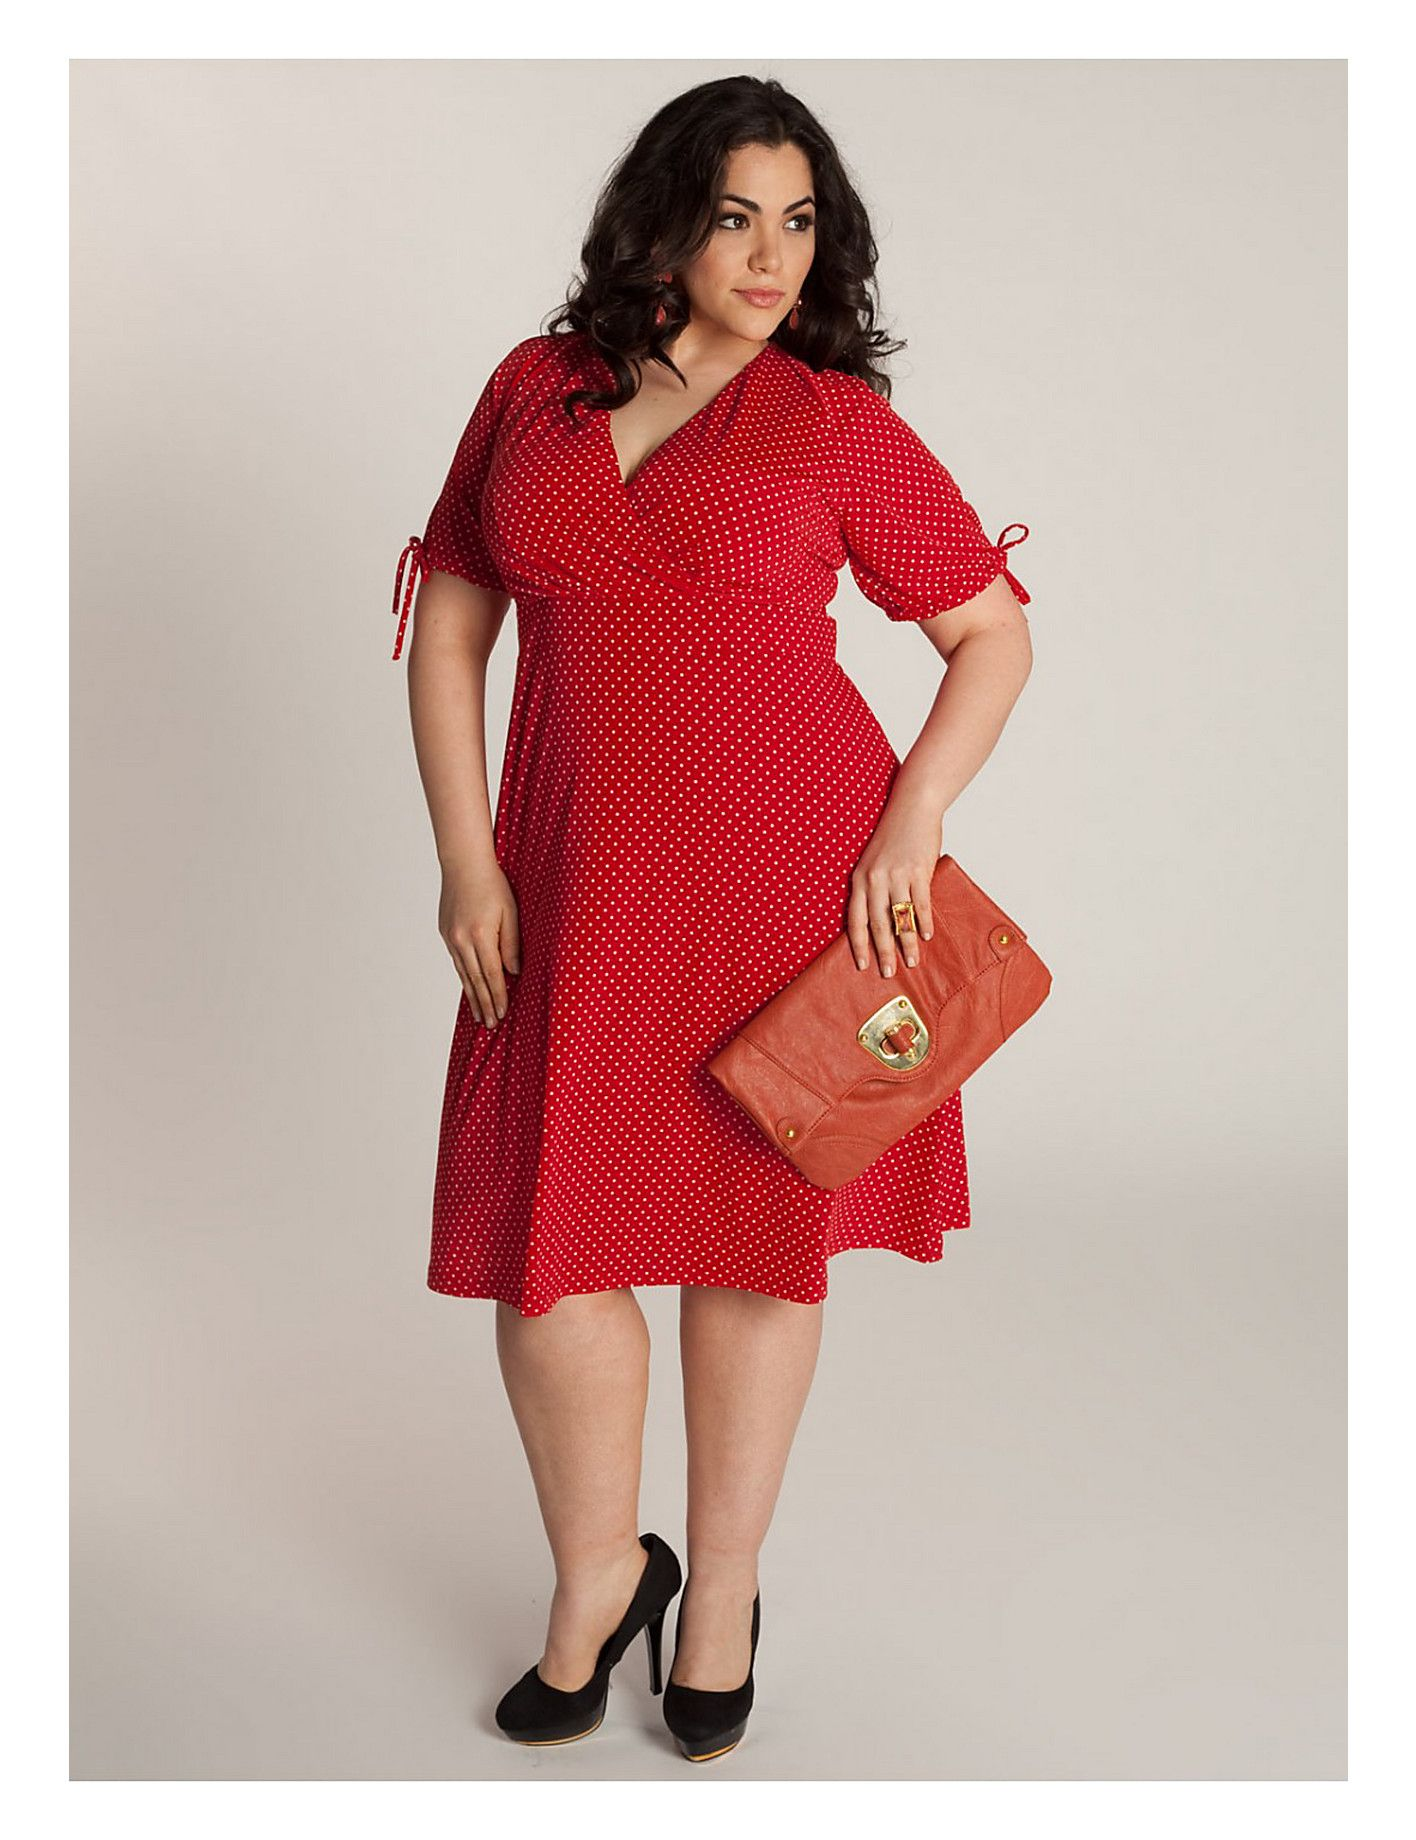 Retro & vintage red polka dot #plus #size dress | #Sonsi | My Style ...